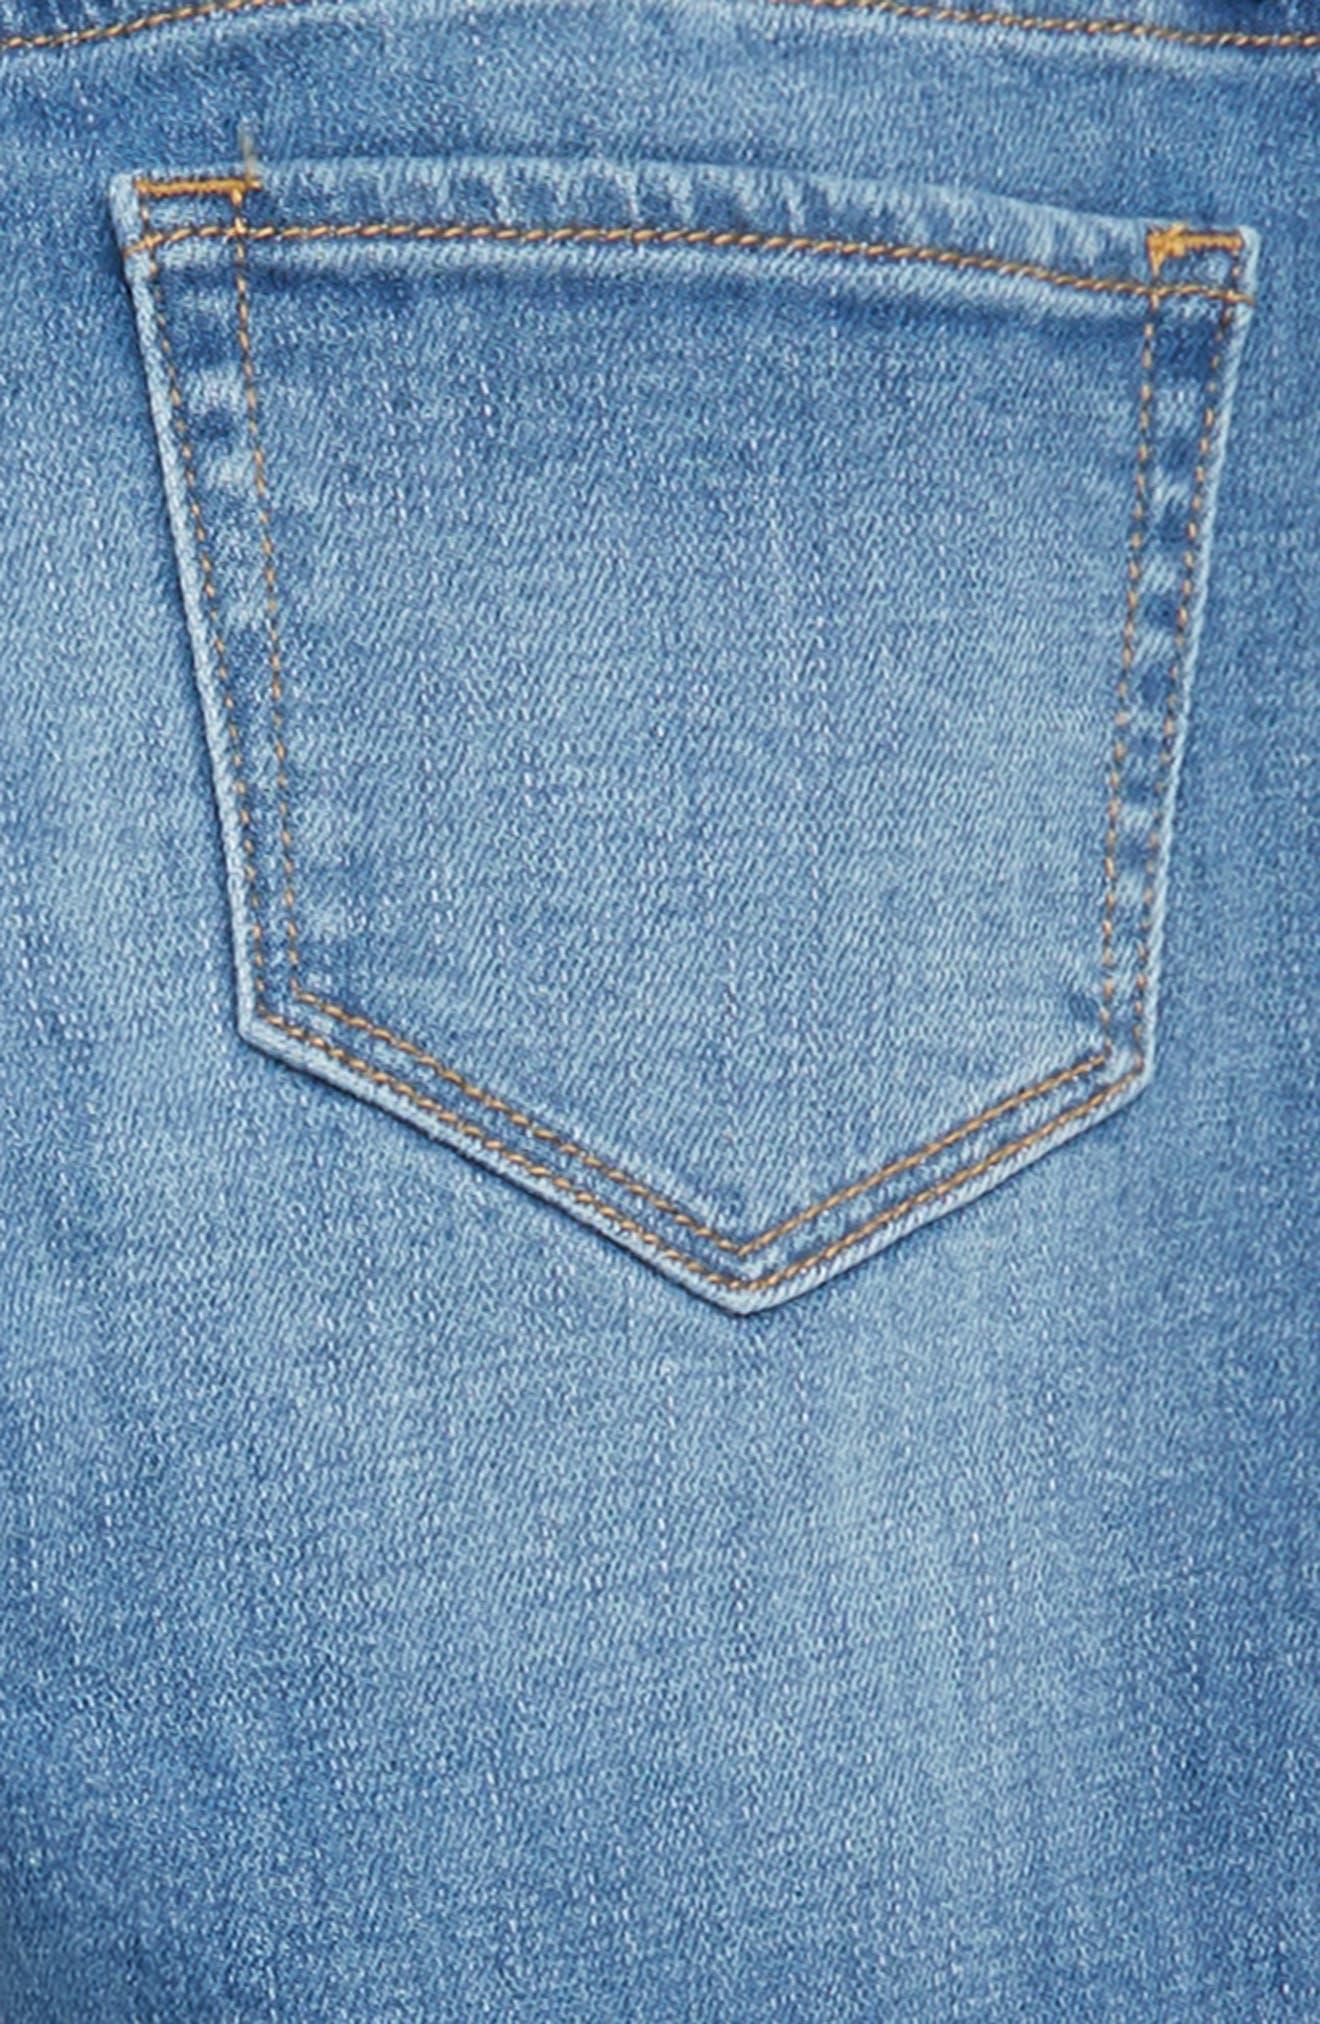 Embroidered Fray Hem Skinny Jeans,                             Alternate thumbnail 3, color,                             420